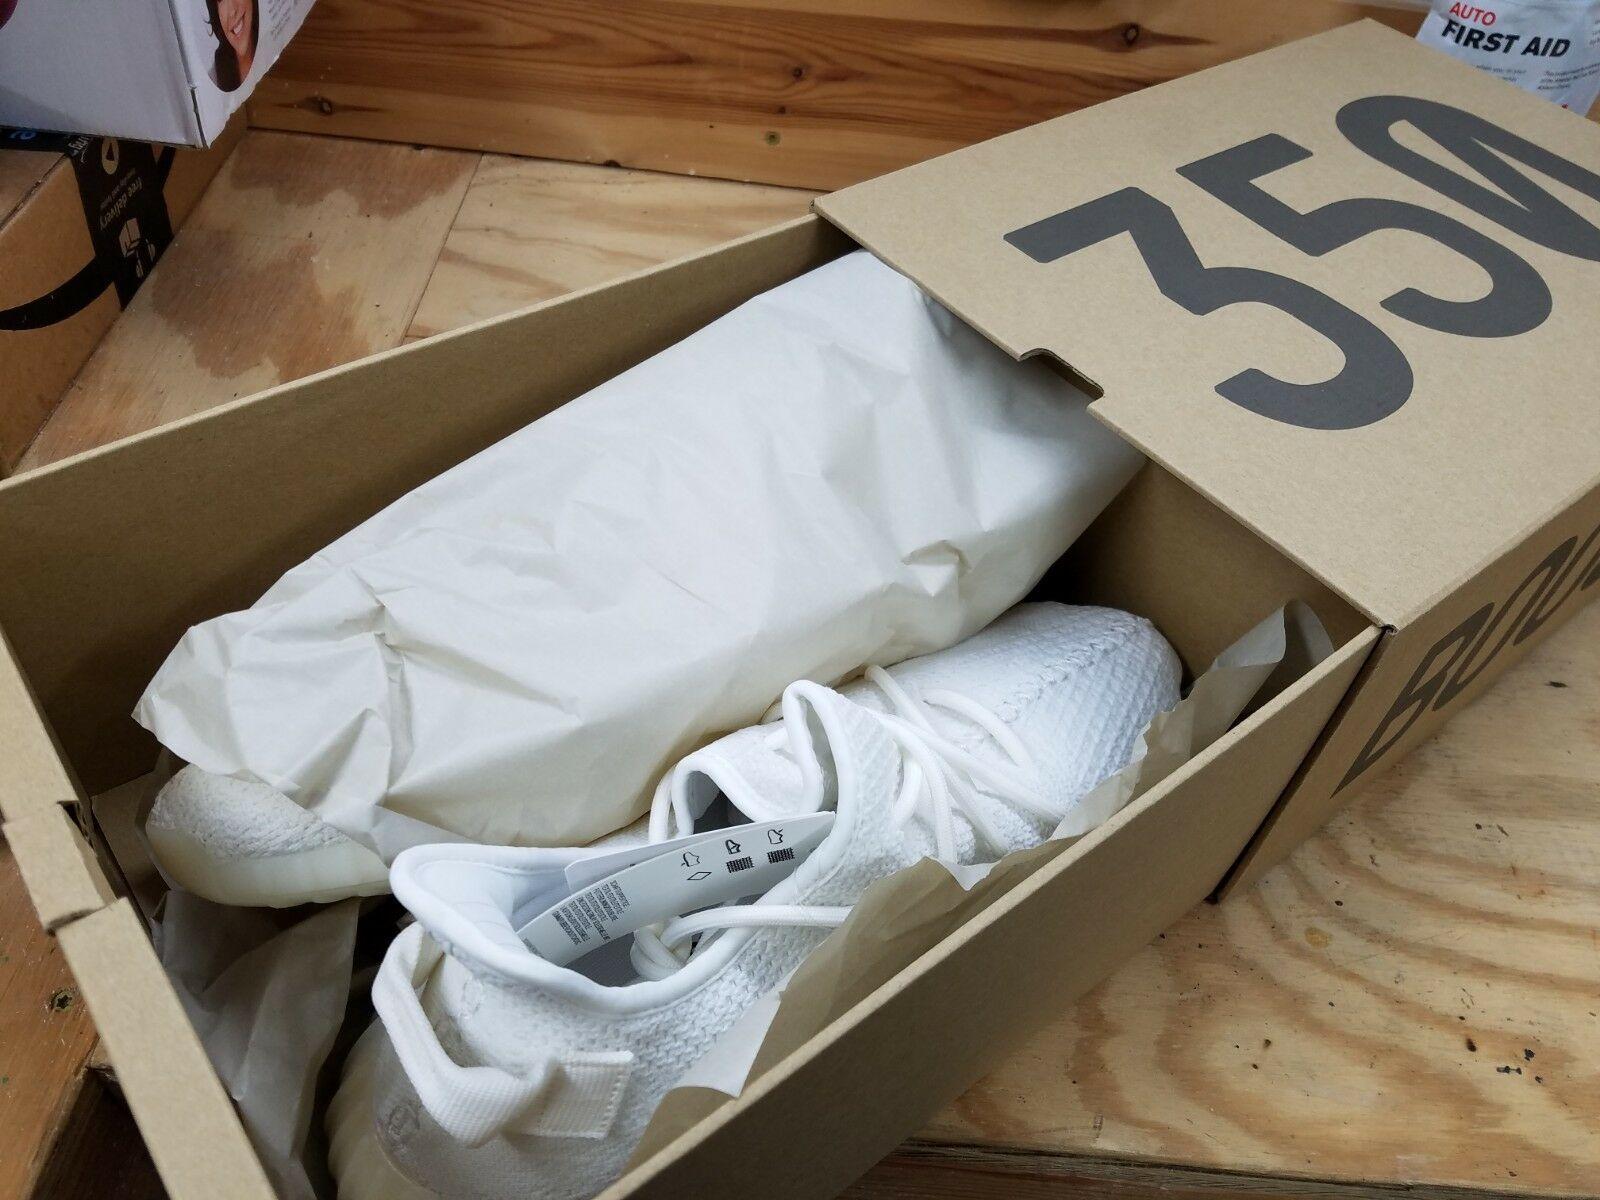 0c2b8b8a14a58 Adidas Yeezy Boost 350 V2 - Triple White (CP9366) - SIZE 12